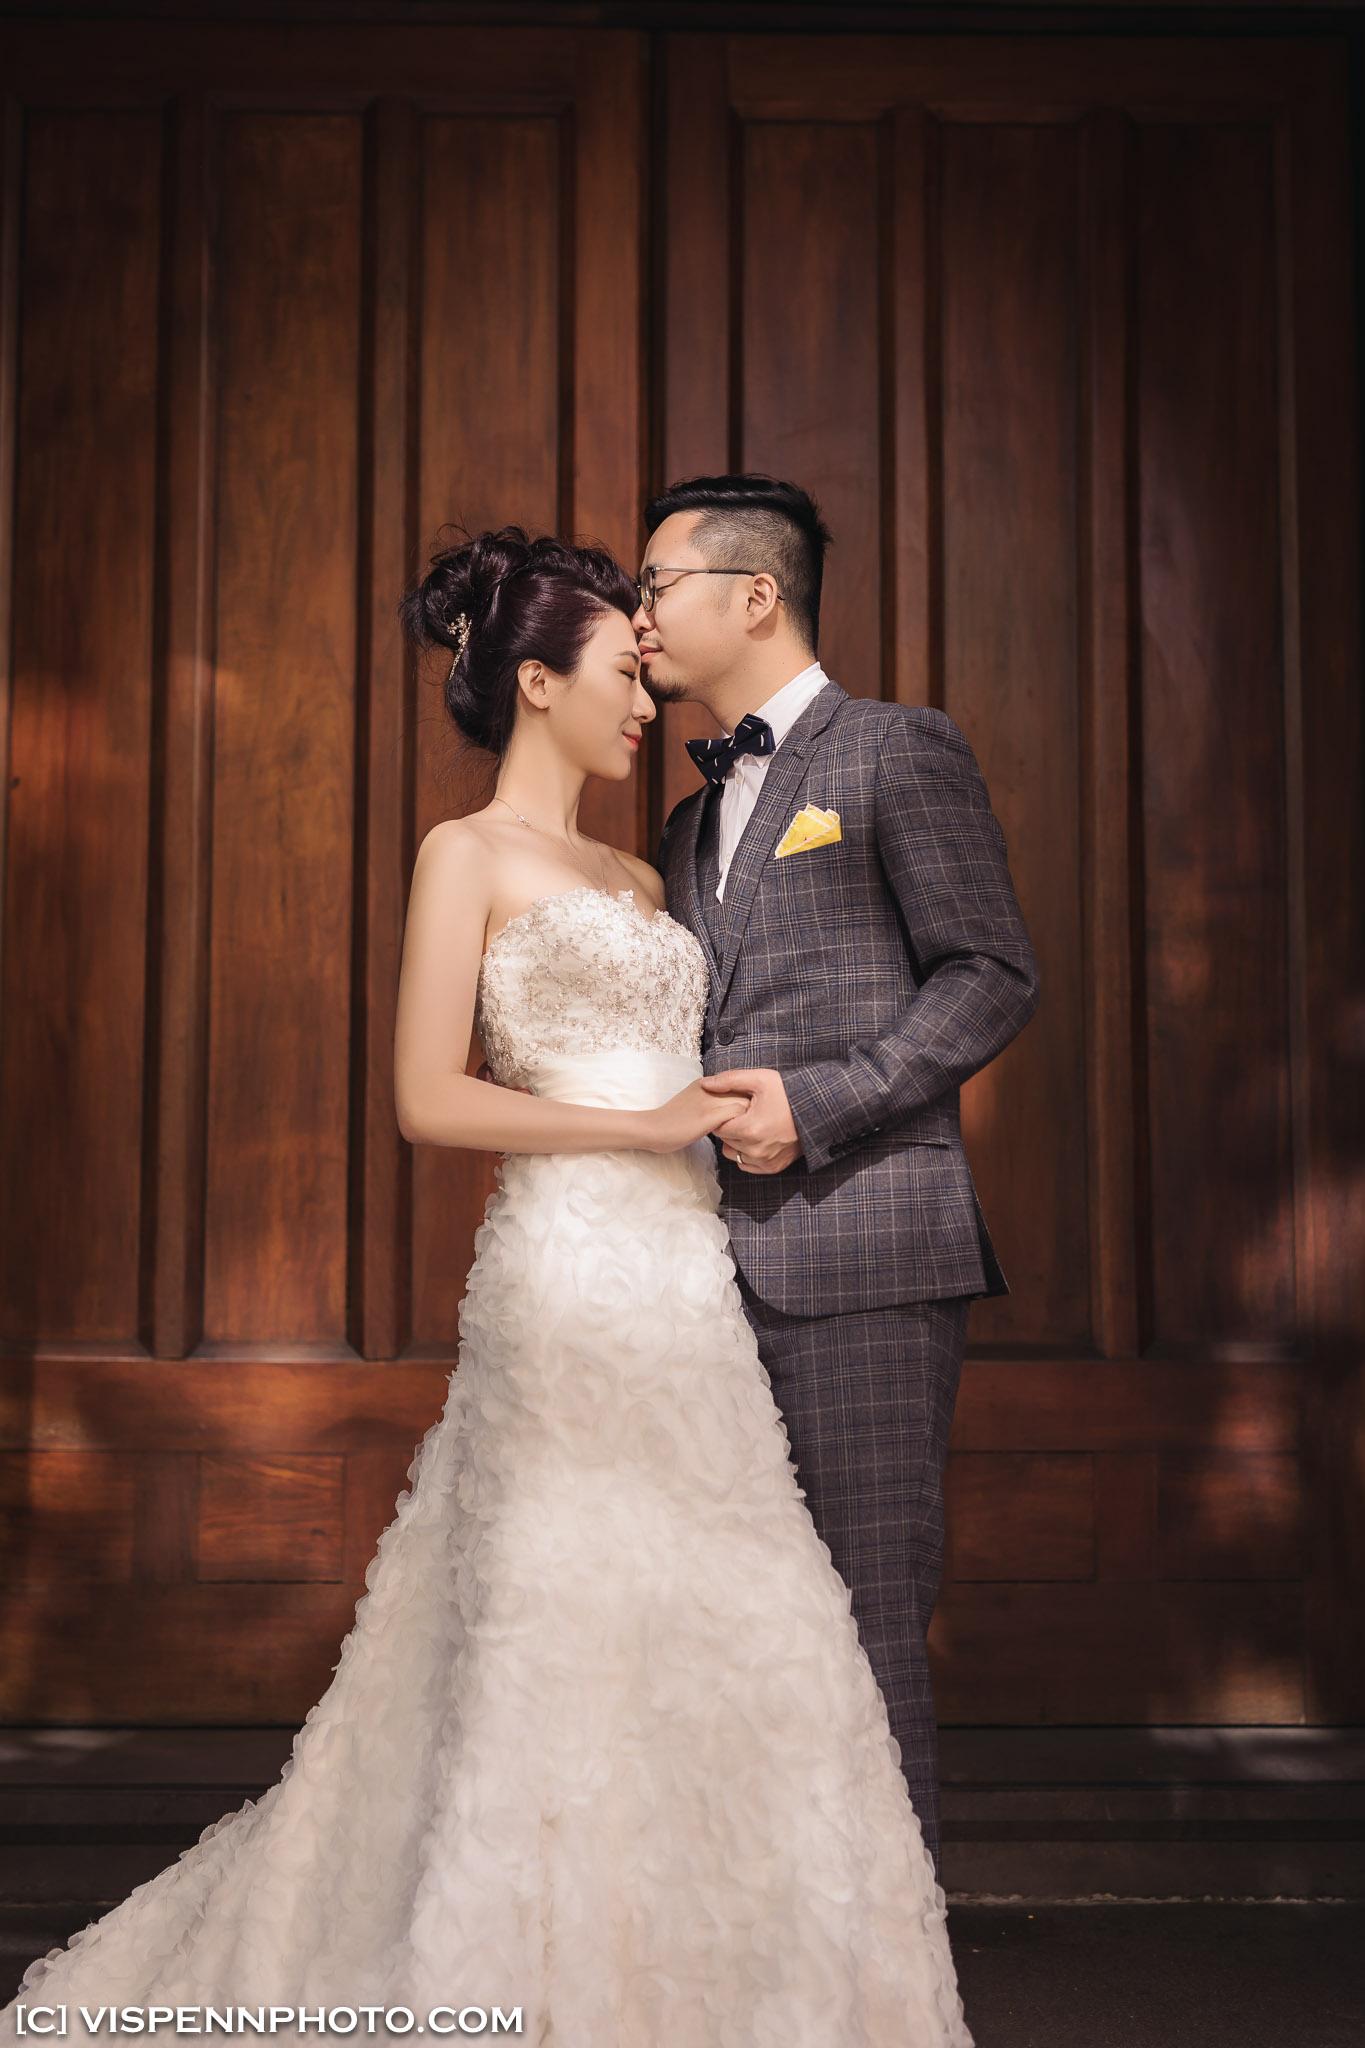 PRE WEDDING Photography Melbourne VISPENN 墨尔本 婚纱照 结婚照 婚纱摄影 VISPENN AmandaXing 2H 5D4 3039